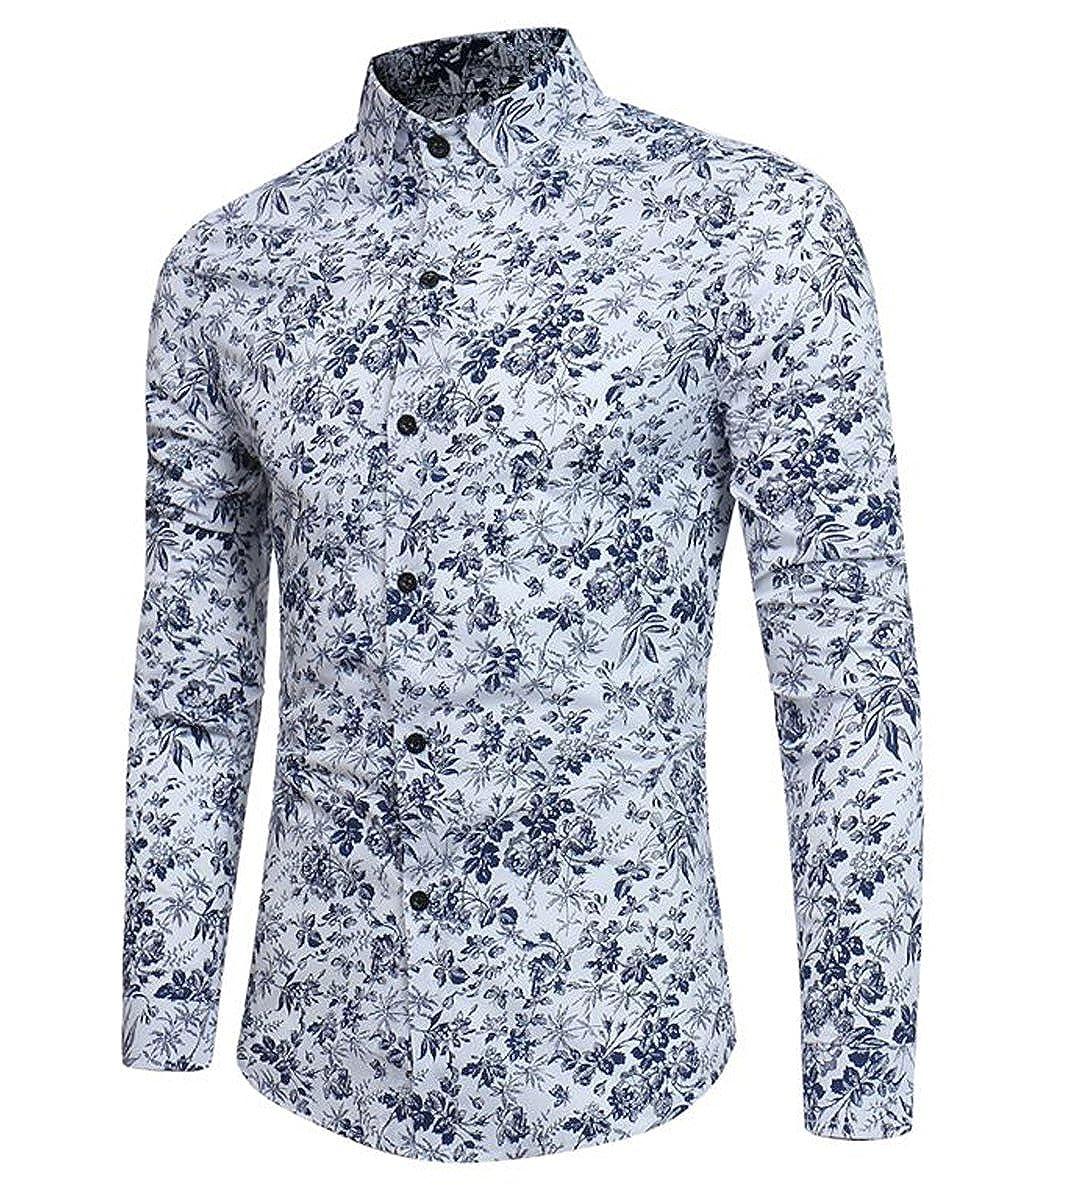 Camisa de lino informal de manga larga para hombre, diseño floral